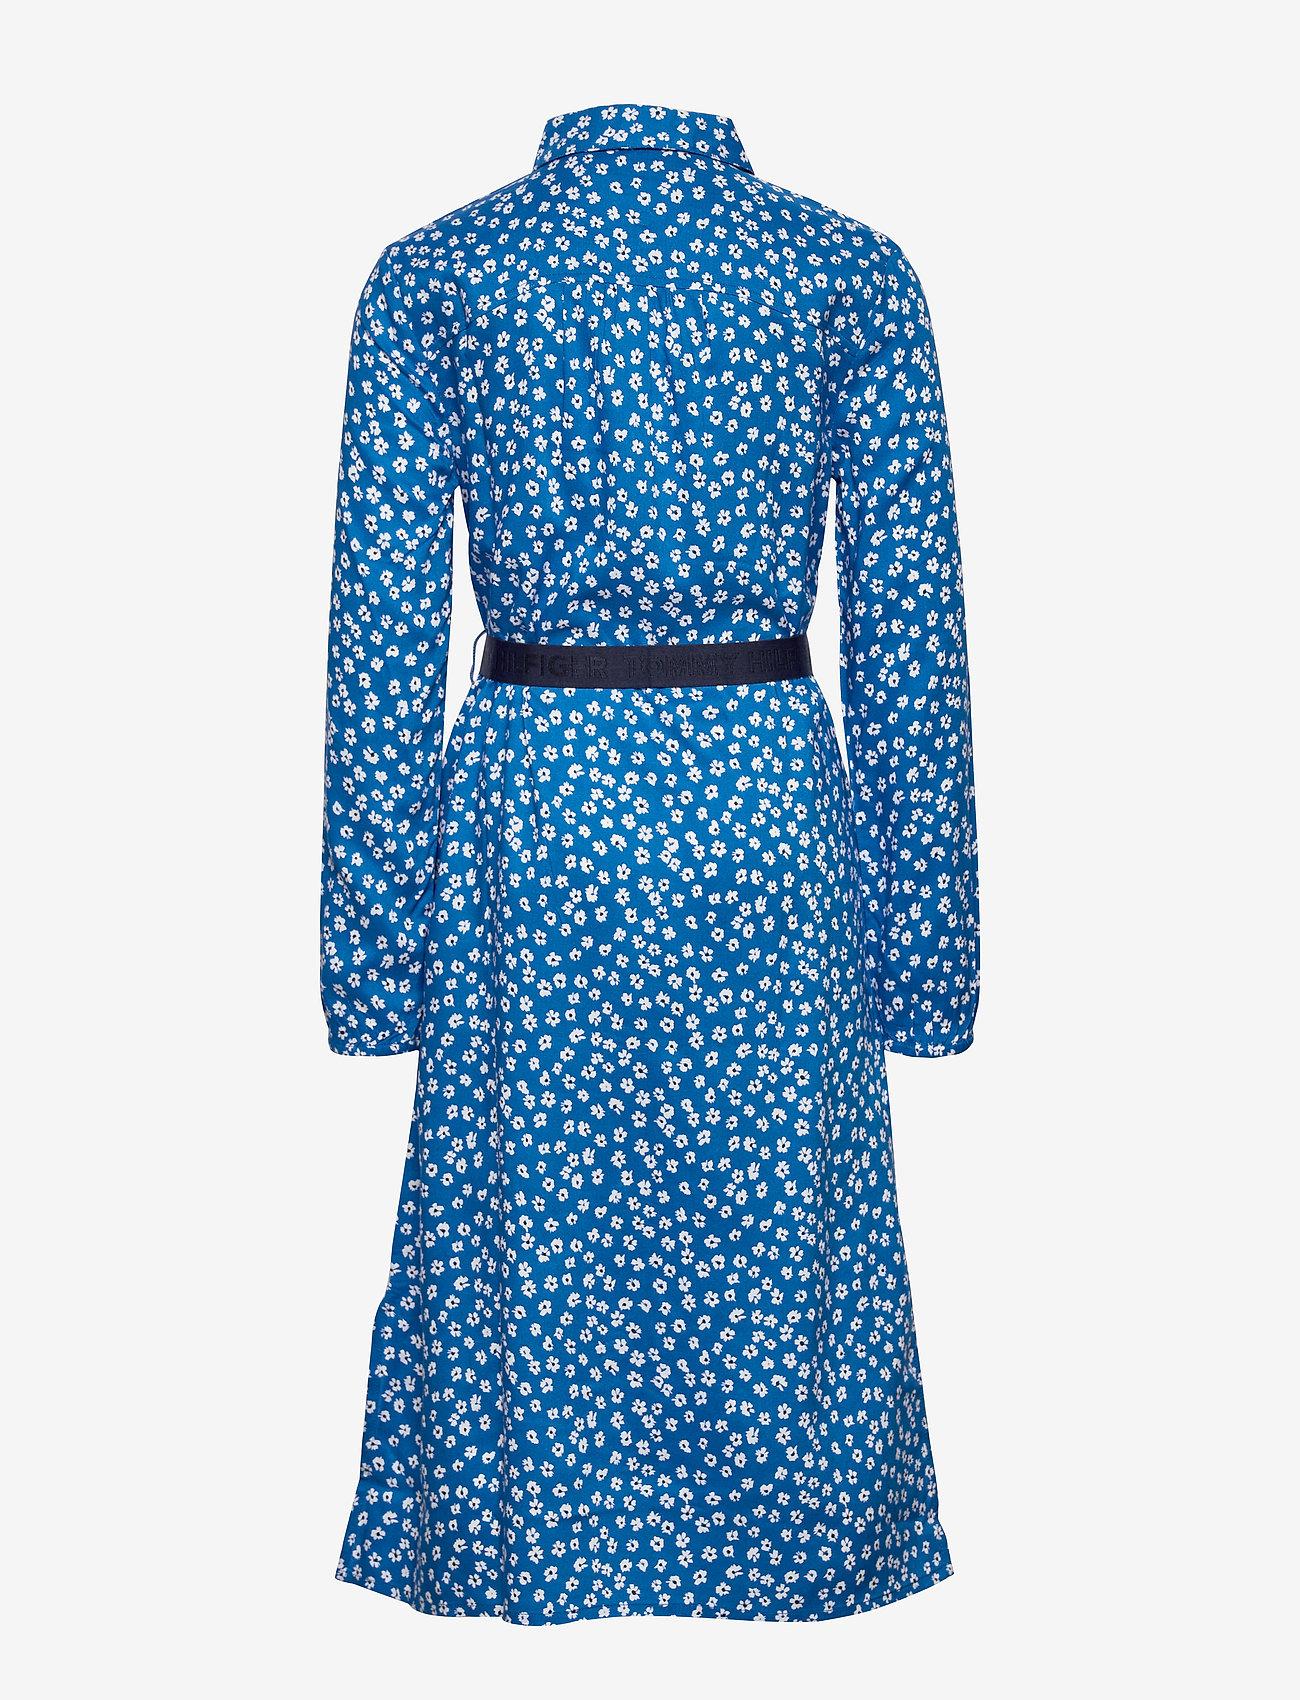 Tommy Hilfiger - DITSY FLOWER PRINT DRESS S/S - robes - dynamic blue/ ditsy flower - 1